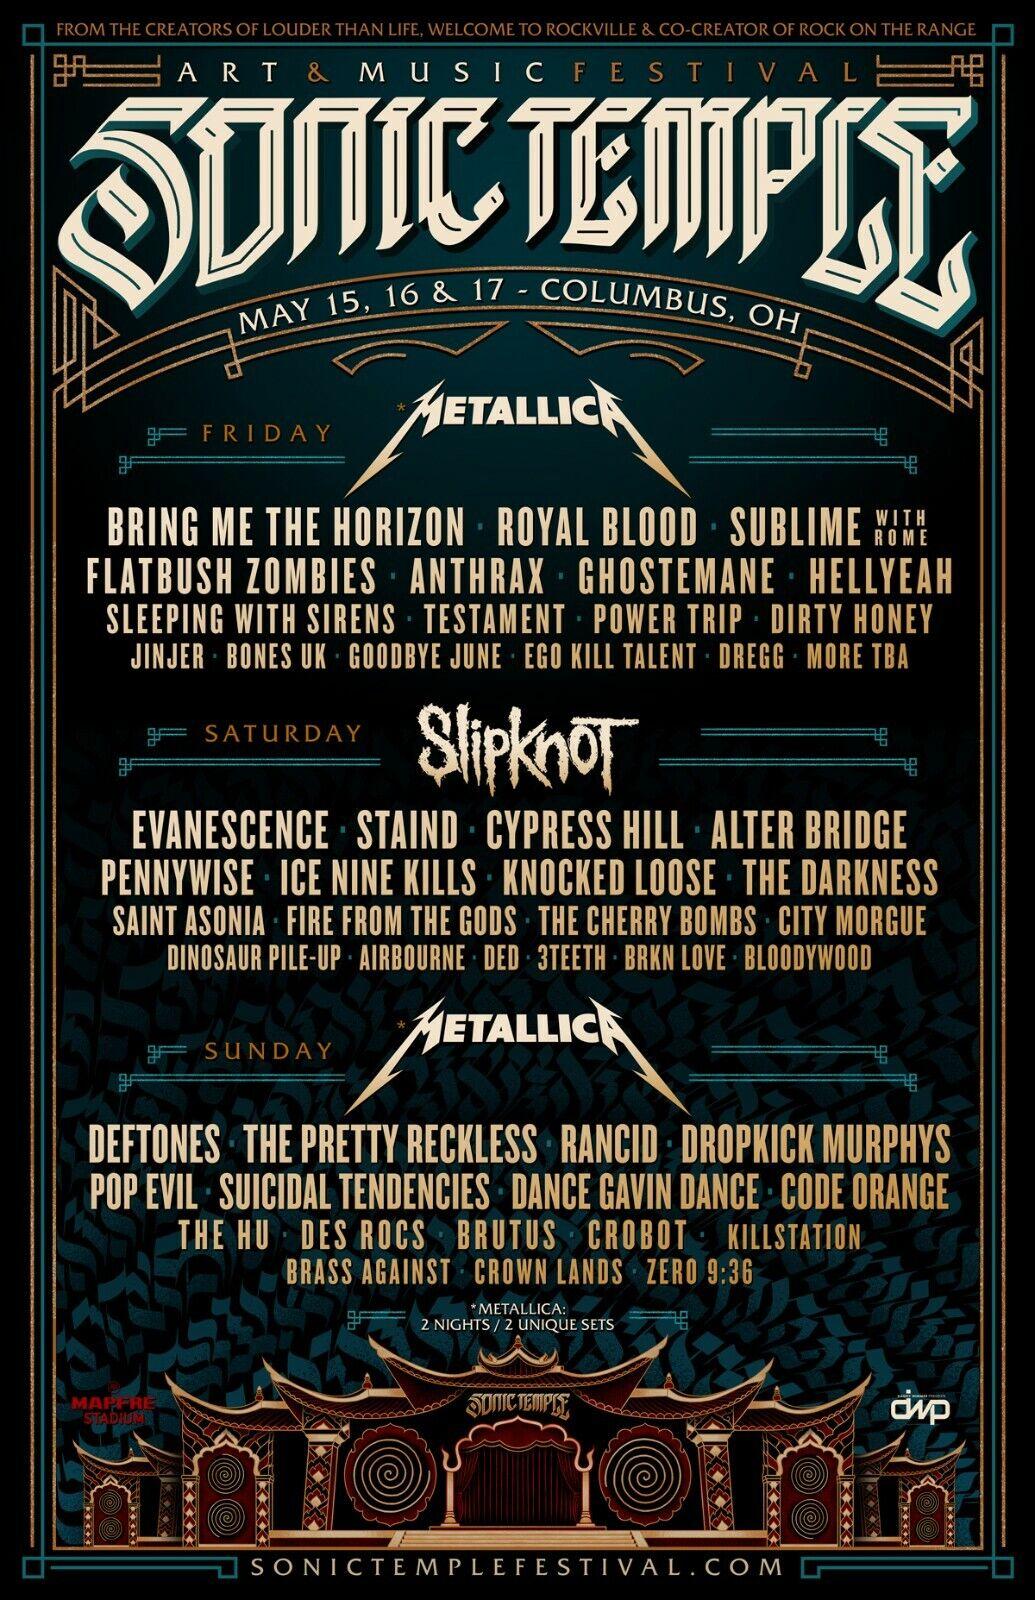 SONIC TEMPLE FESTIVAL 2020 CONCERT POSTER -Metallica, Slipknot, Deftones, Staind - $11.99